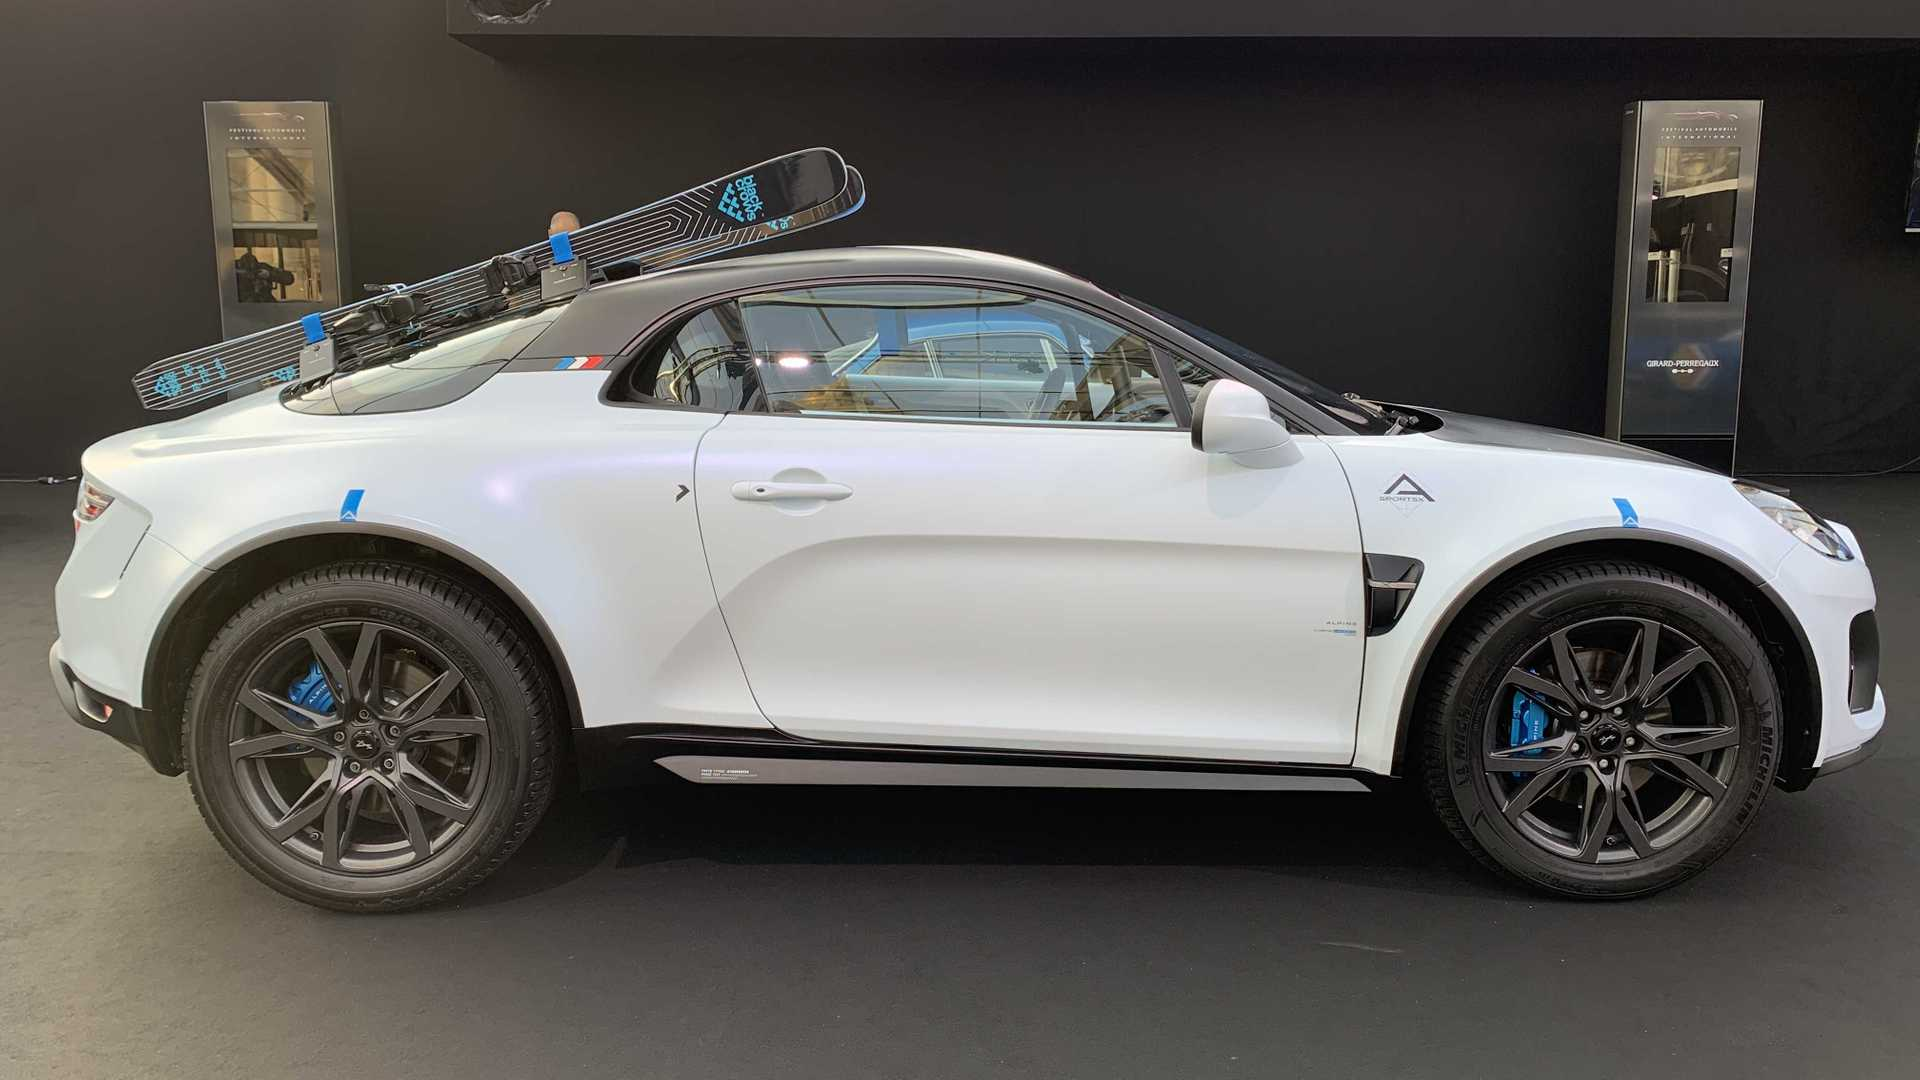 Alpine A110 SportsX revealed: Mid-engined sports car, SUV traits